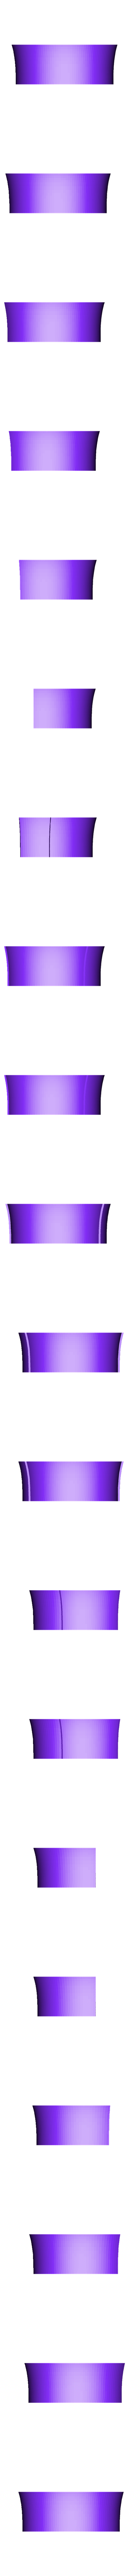 Breen_v3_part_5.stl Download free STL file Breen Helmet • 3D printer template, poblocki1982